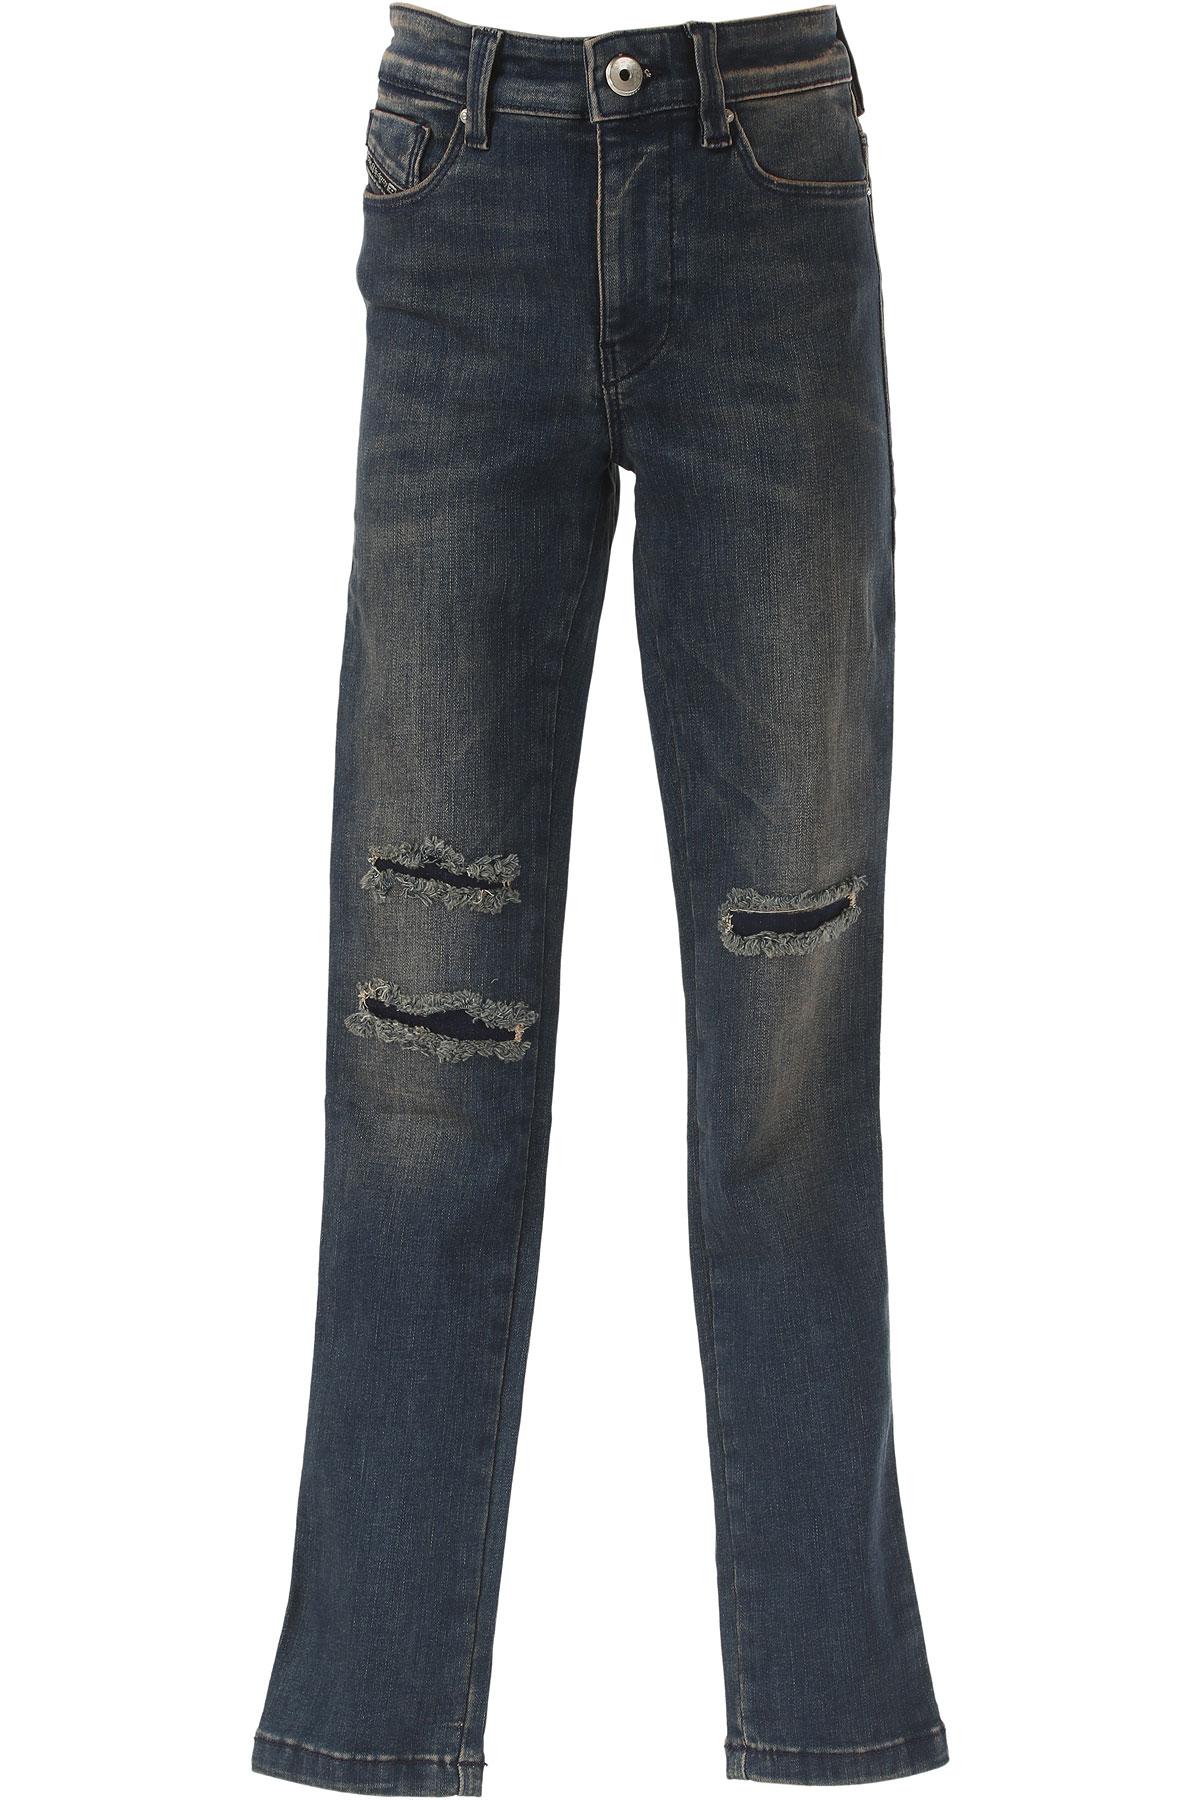 Diesel Kids Jeans for Girls On Sale in Outlet, Denim, Cotton, 2017, 16Y 4Y 8Y